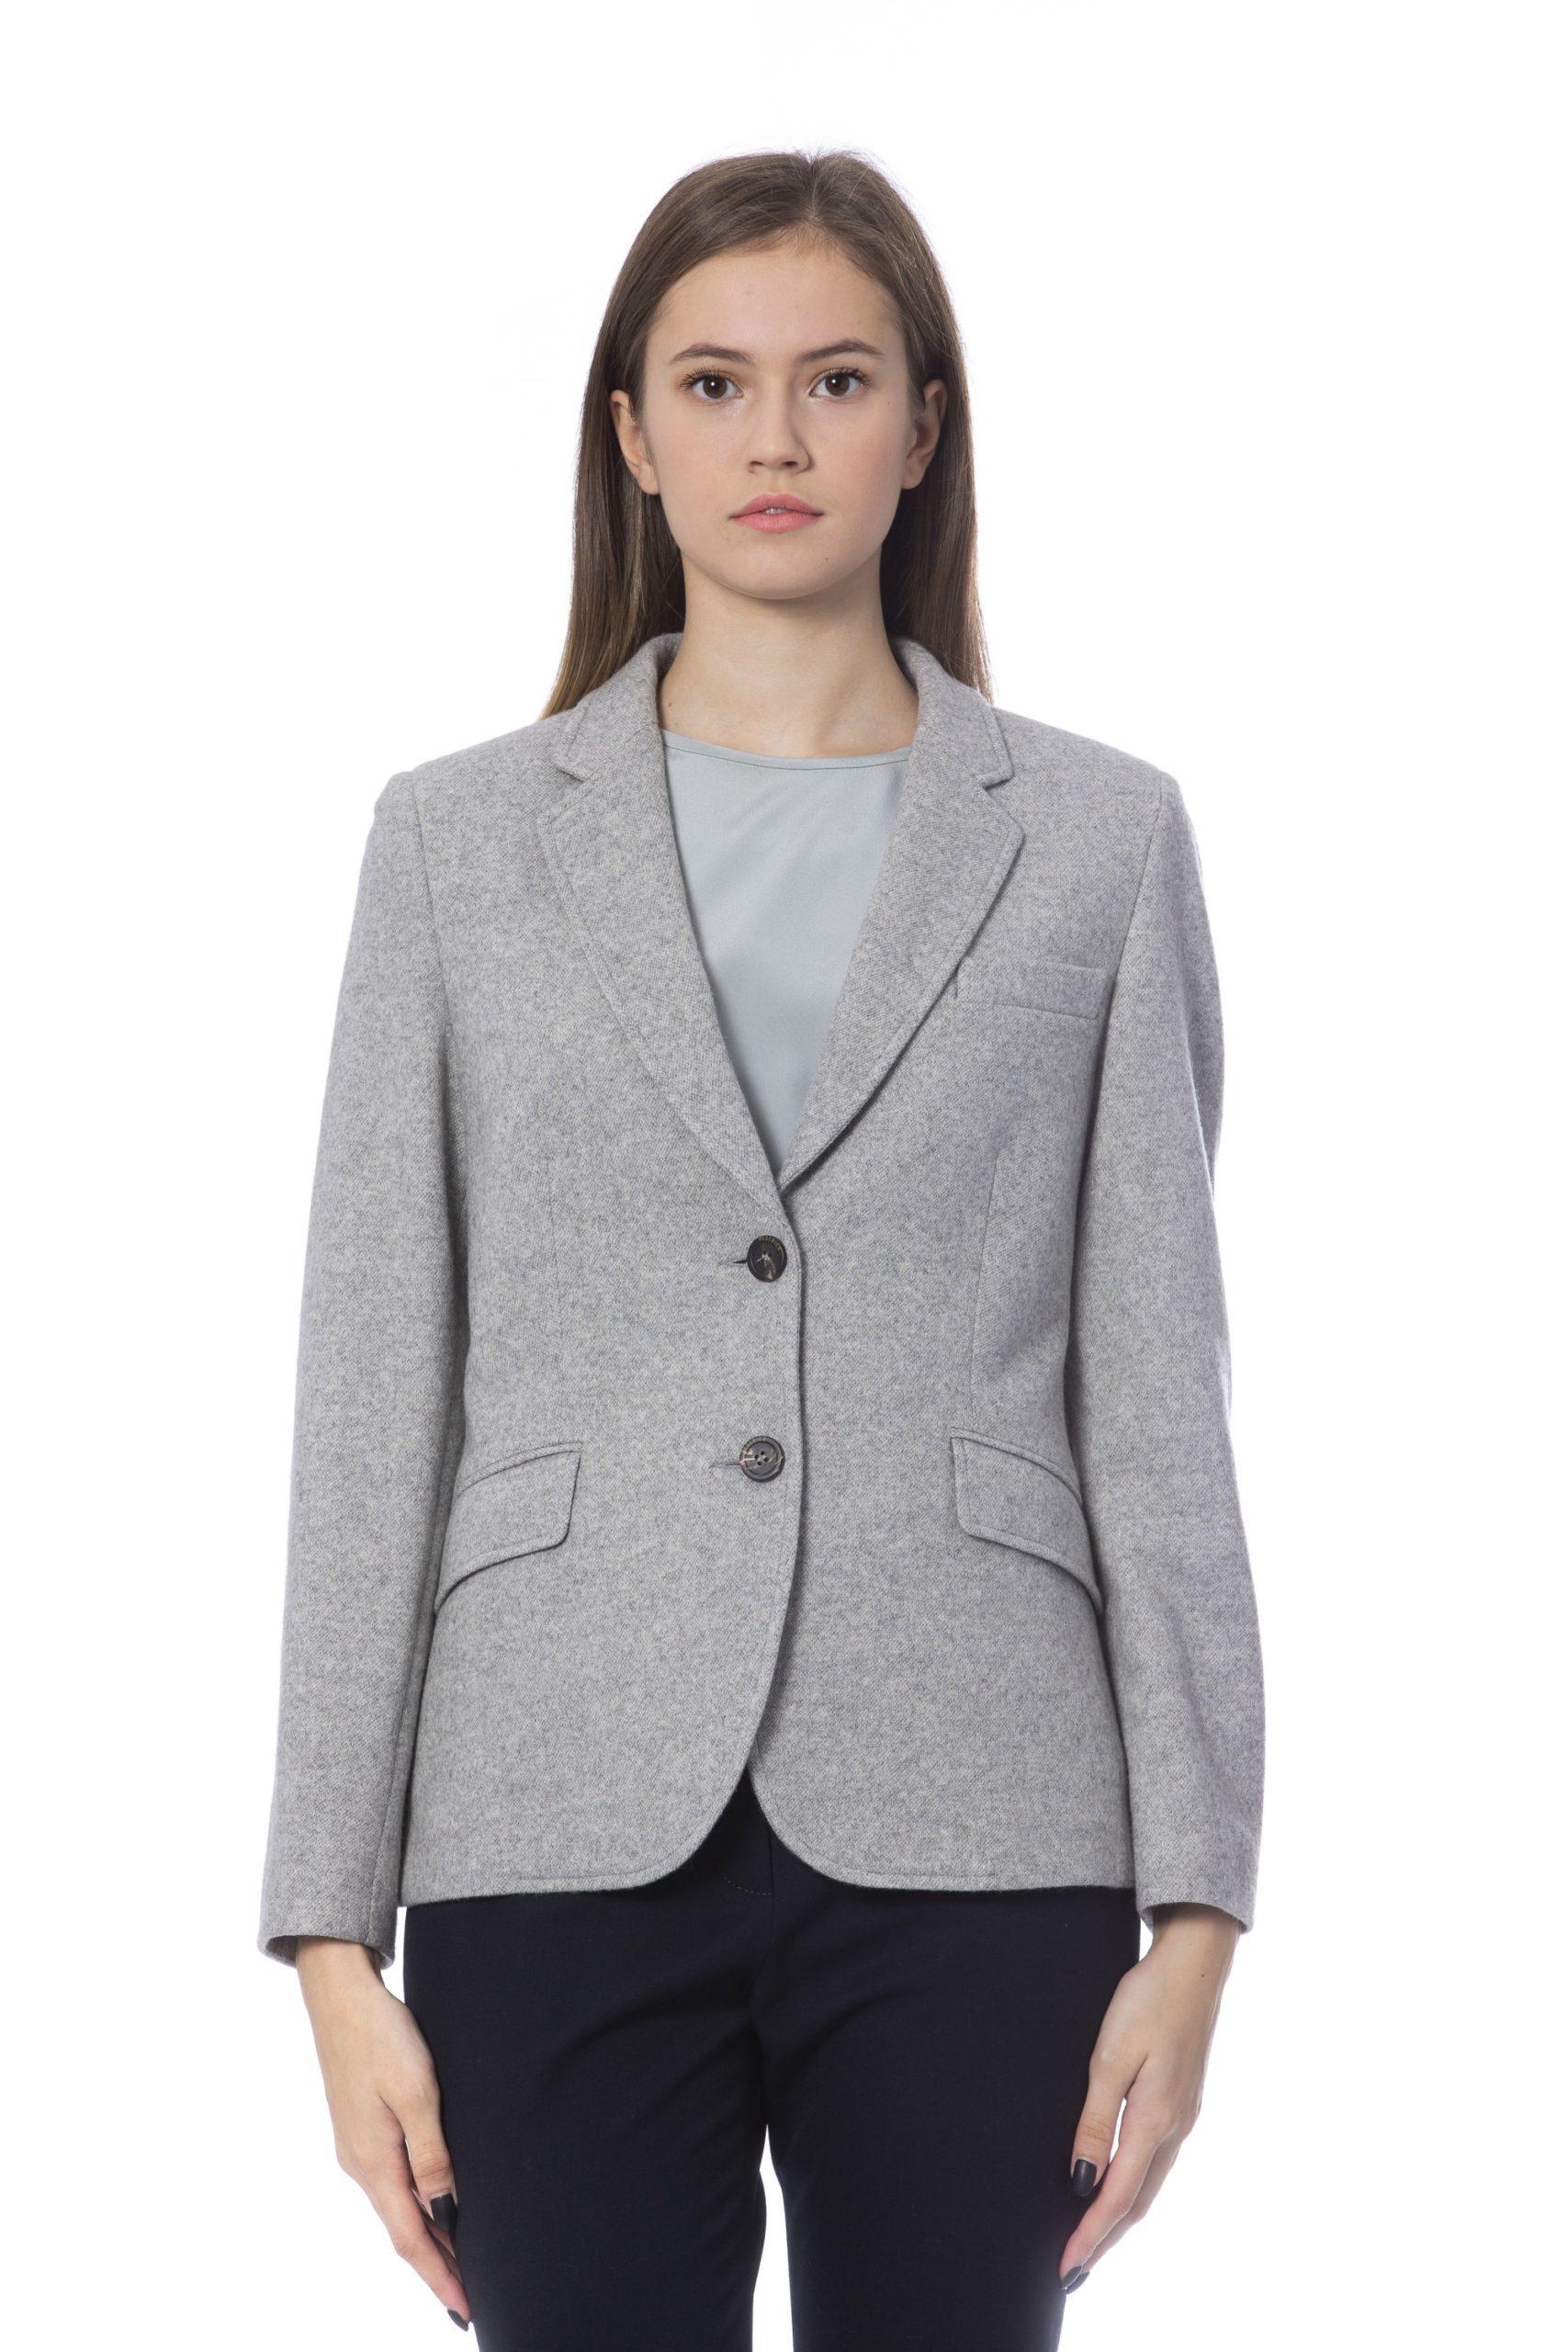 Peserico Women's Jacket Grey PE854540 - IT48 | XL